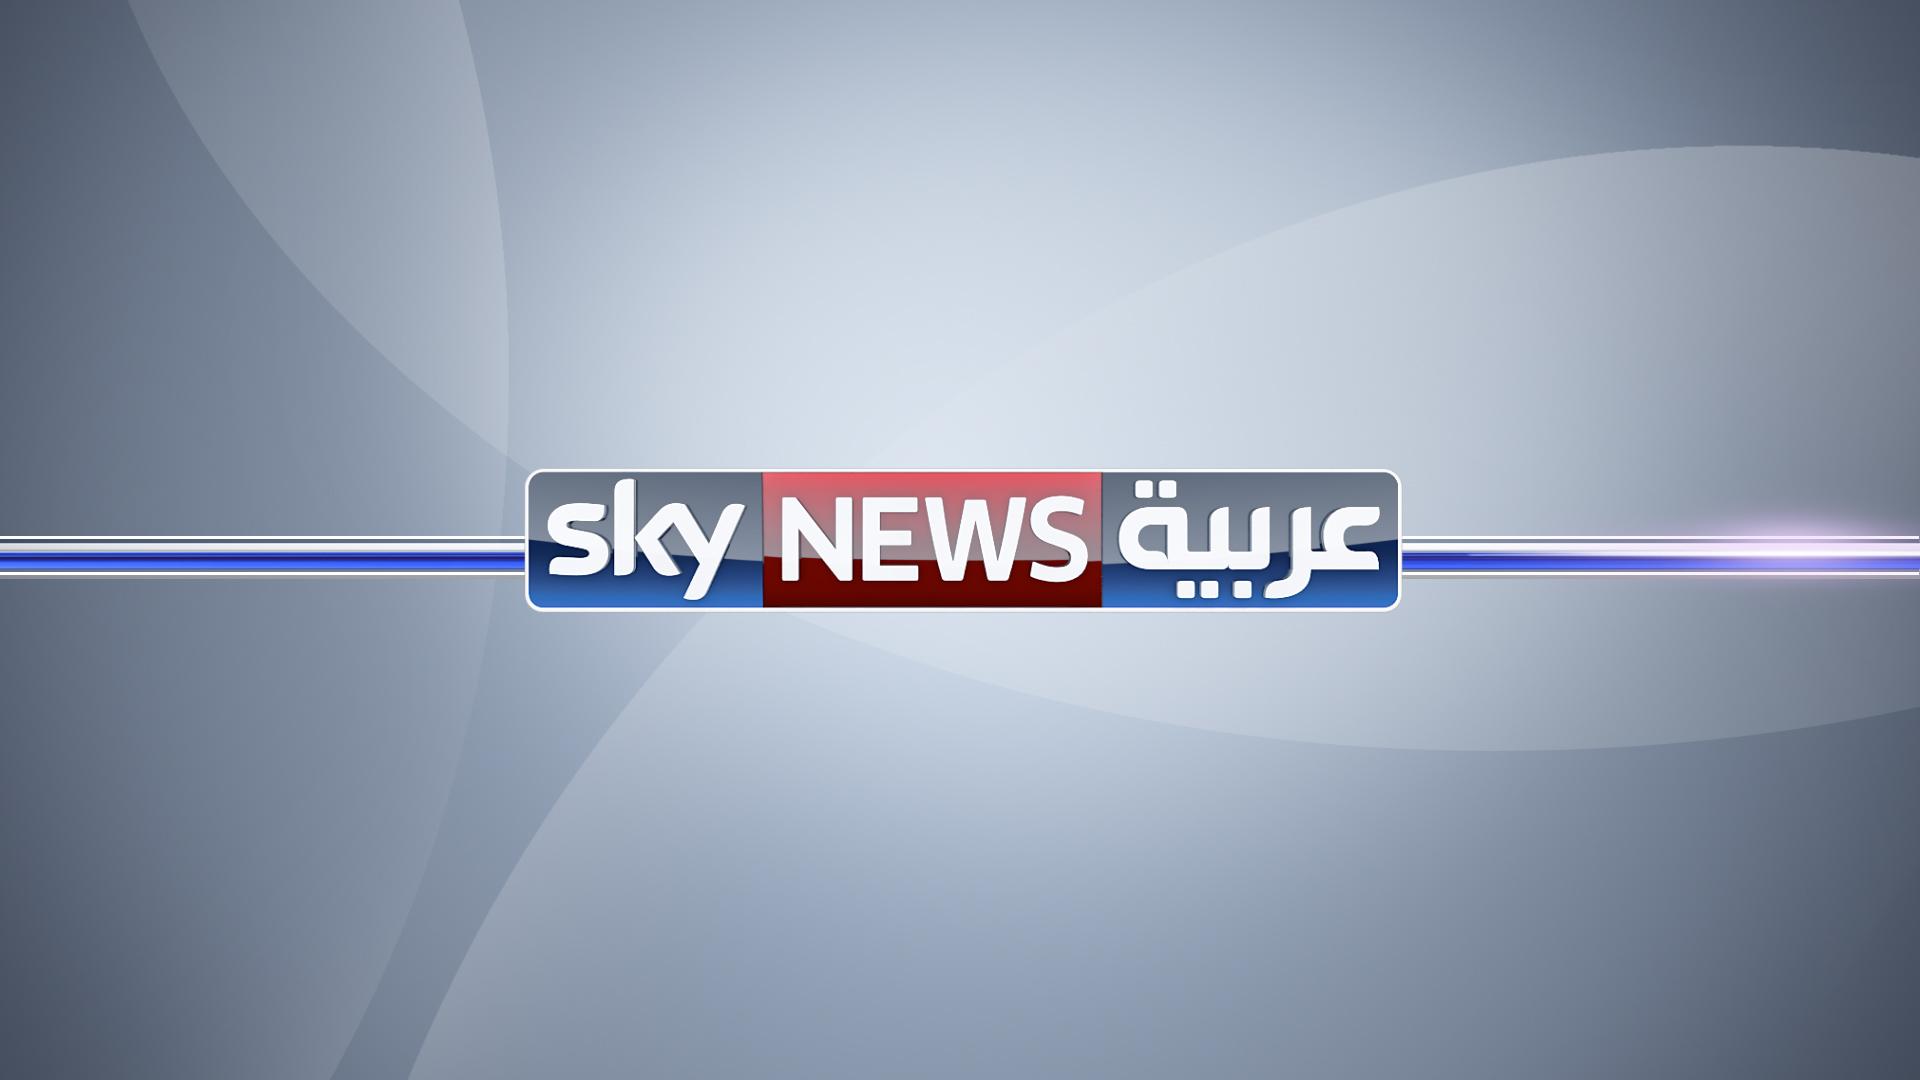 NCS_Sky-News_016